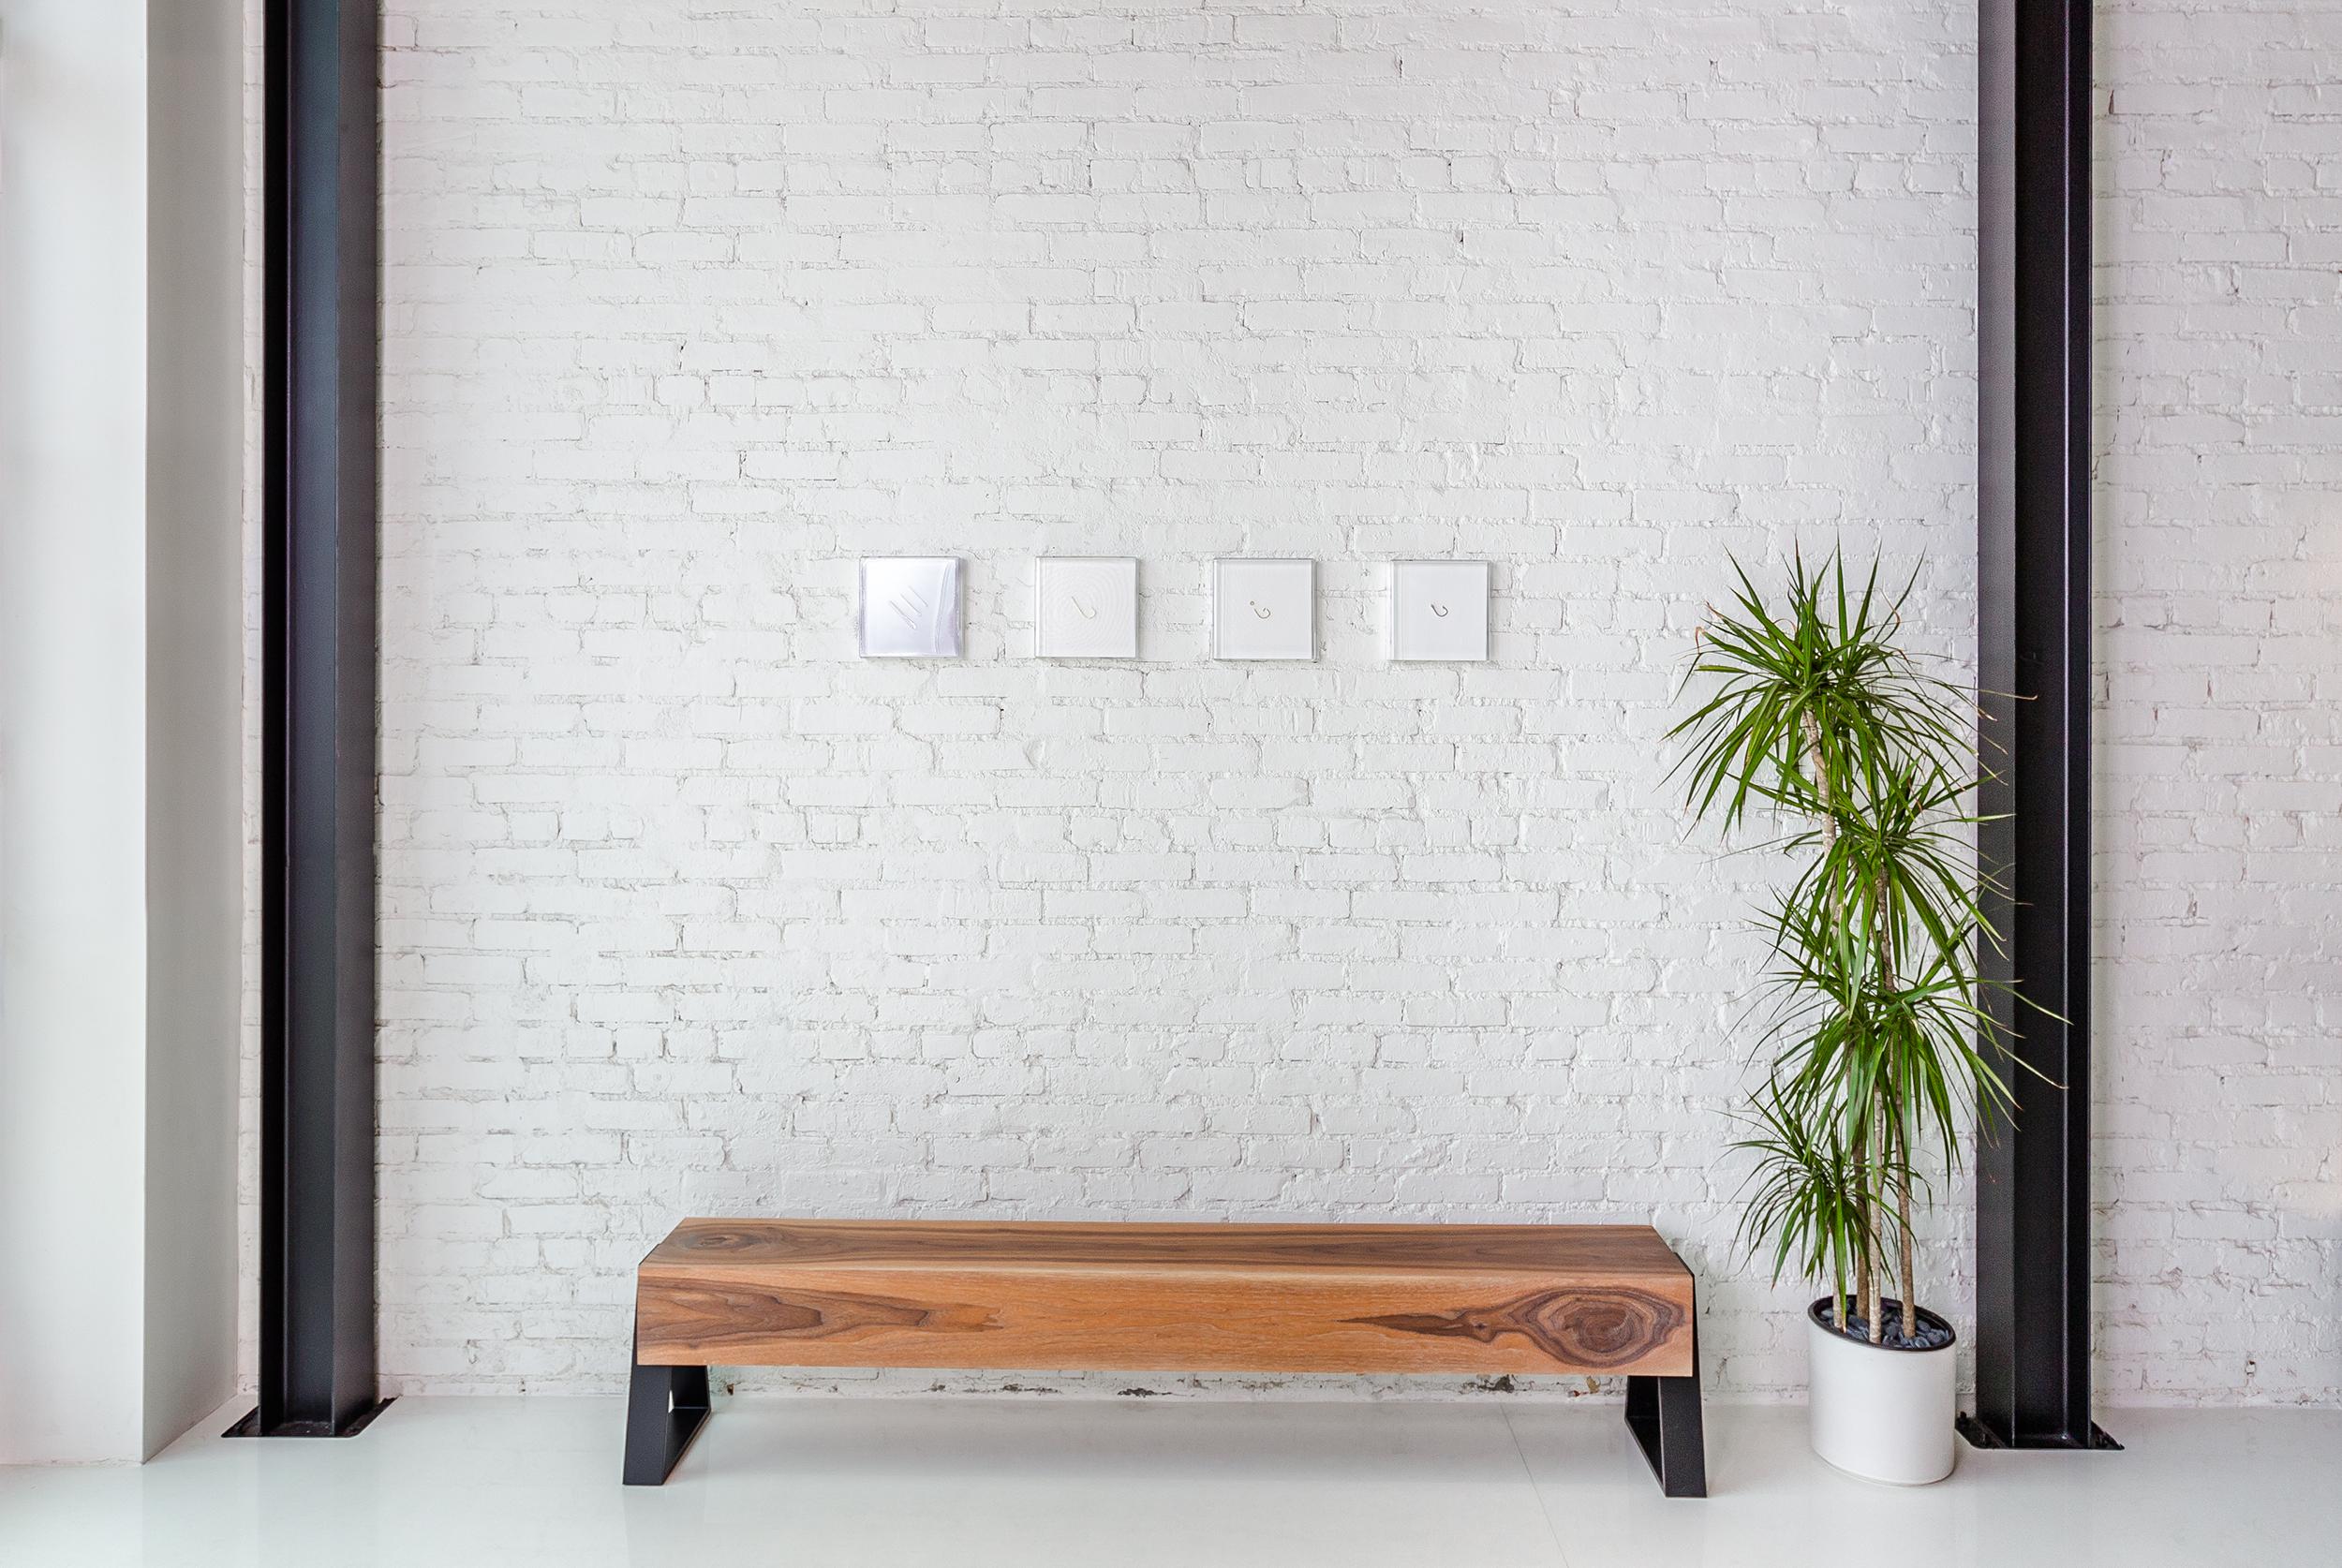 miansai-bench-design.jpg